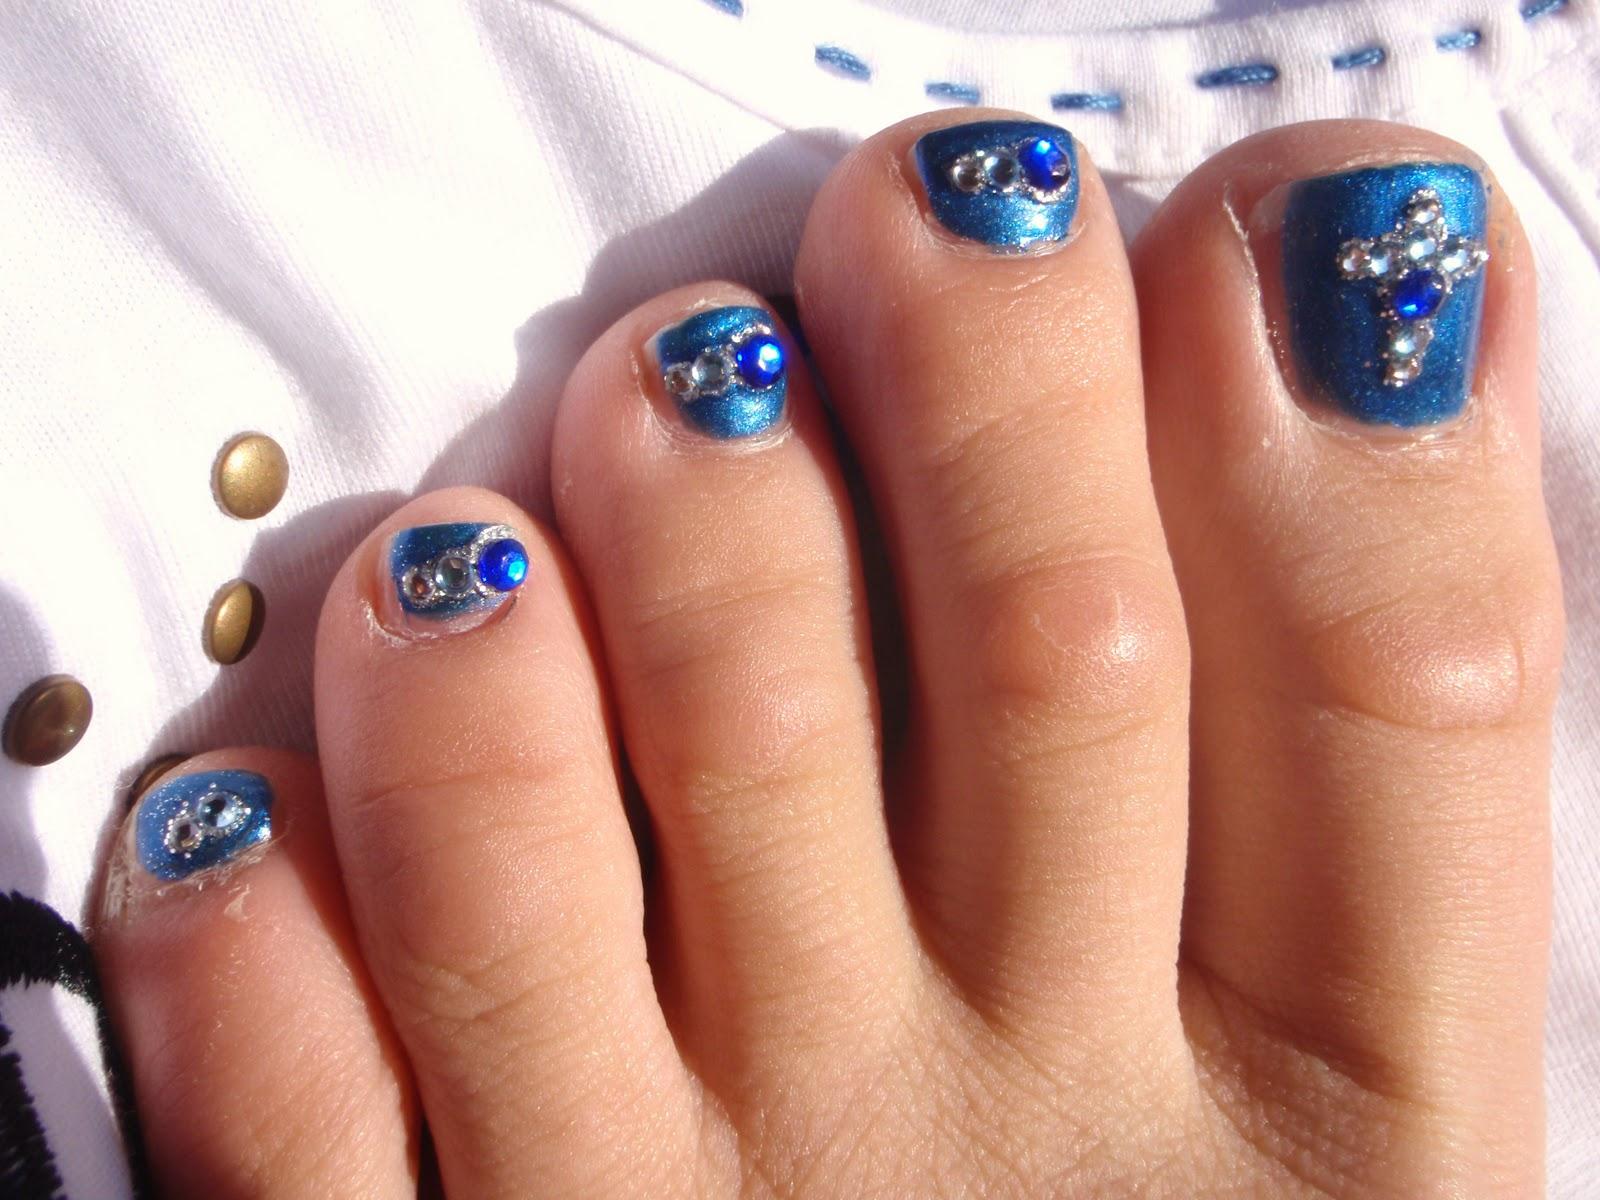 Nail Art 101: Nail Designs Pictures Choices : 6 Easy Toe Nail ...